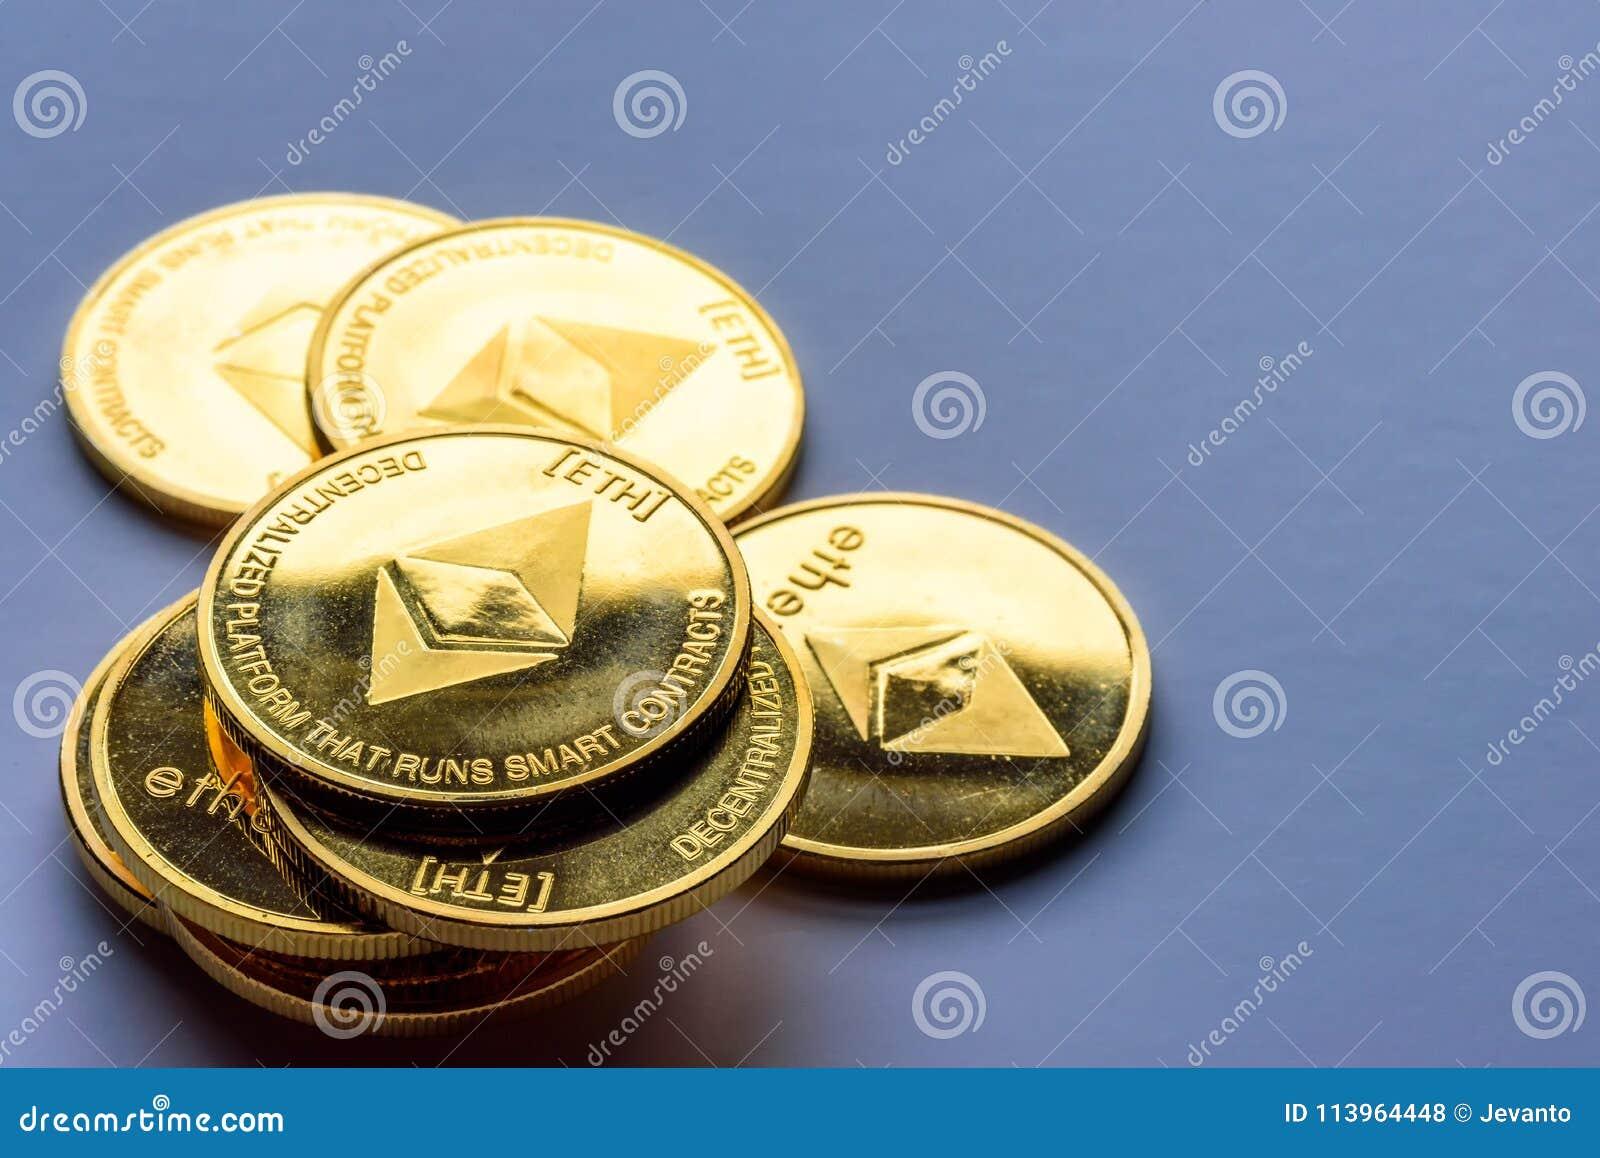 cheap virtual currency